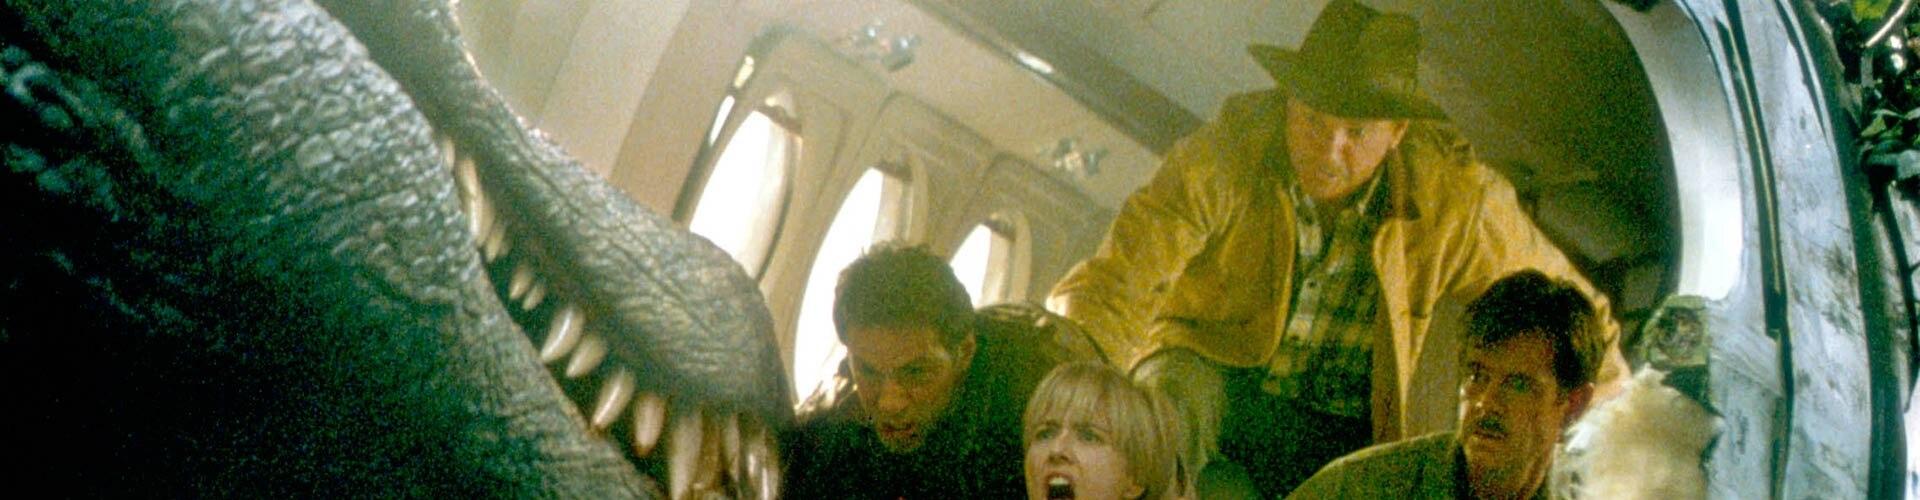 Watch Jurassic Park III Online